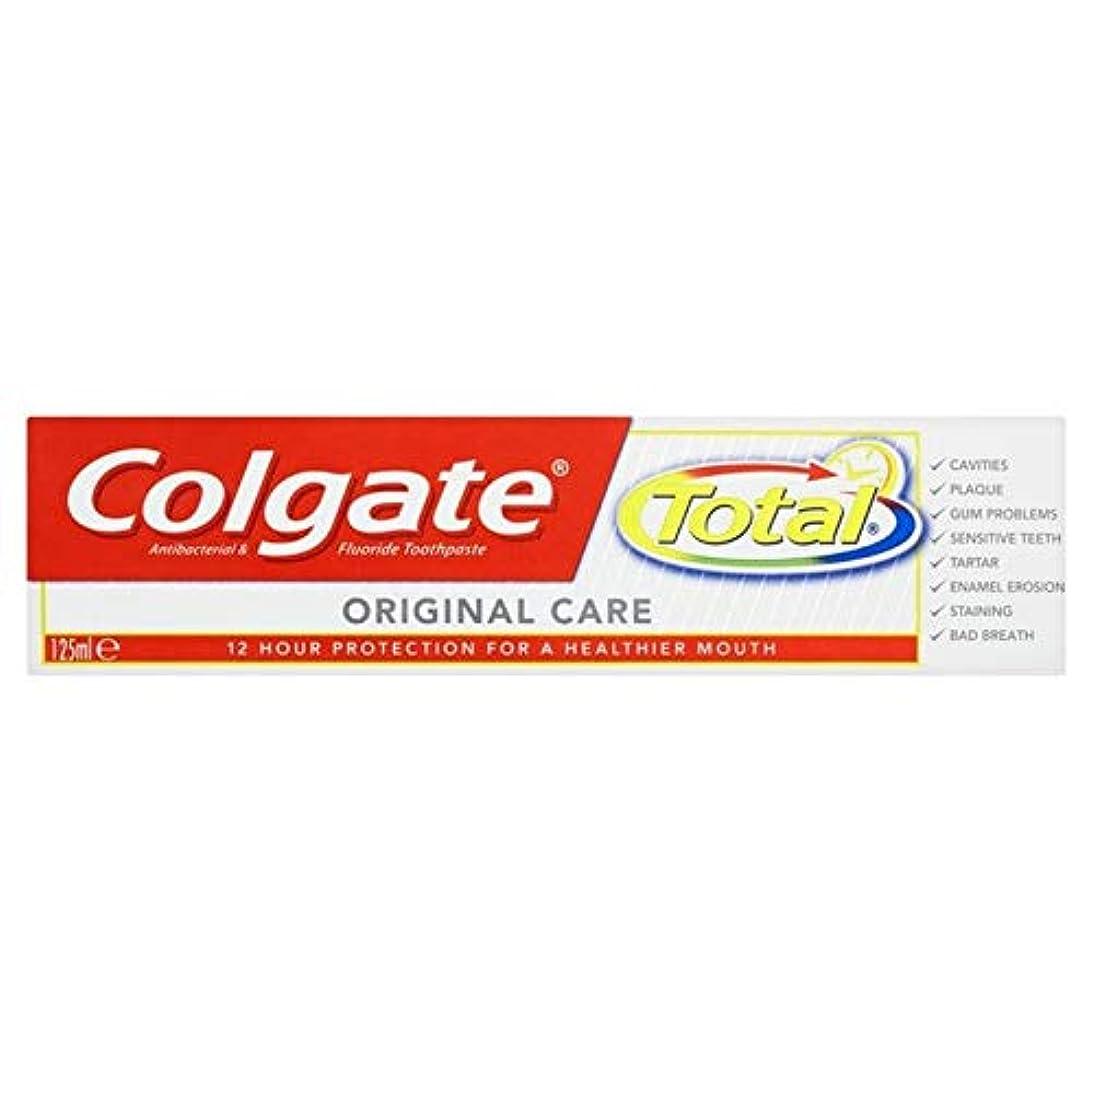 [Colgate ] コルゲートトータル高度な歯磨き粉の125ミリリットル - Colgate Total Advanced Toothpaste 125ml [並行輸入品]